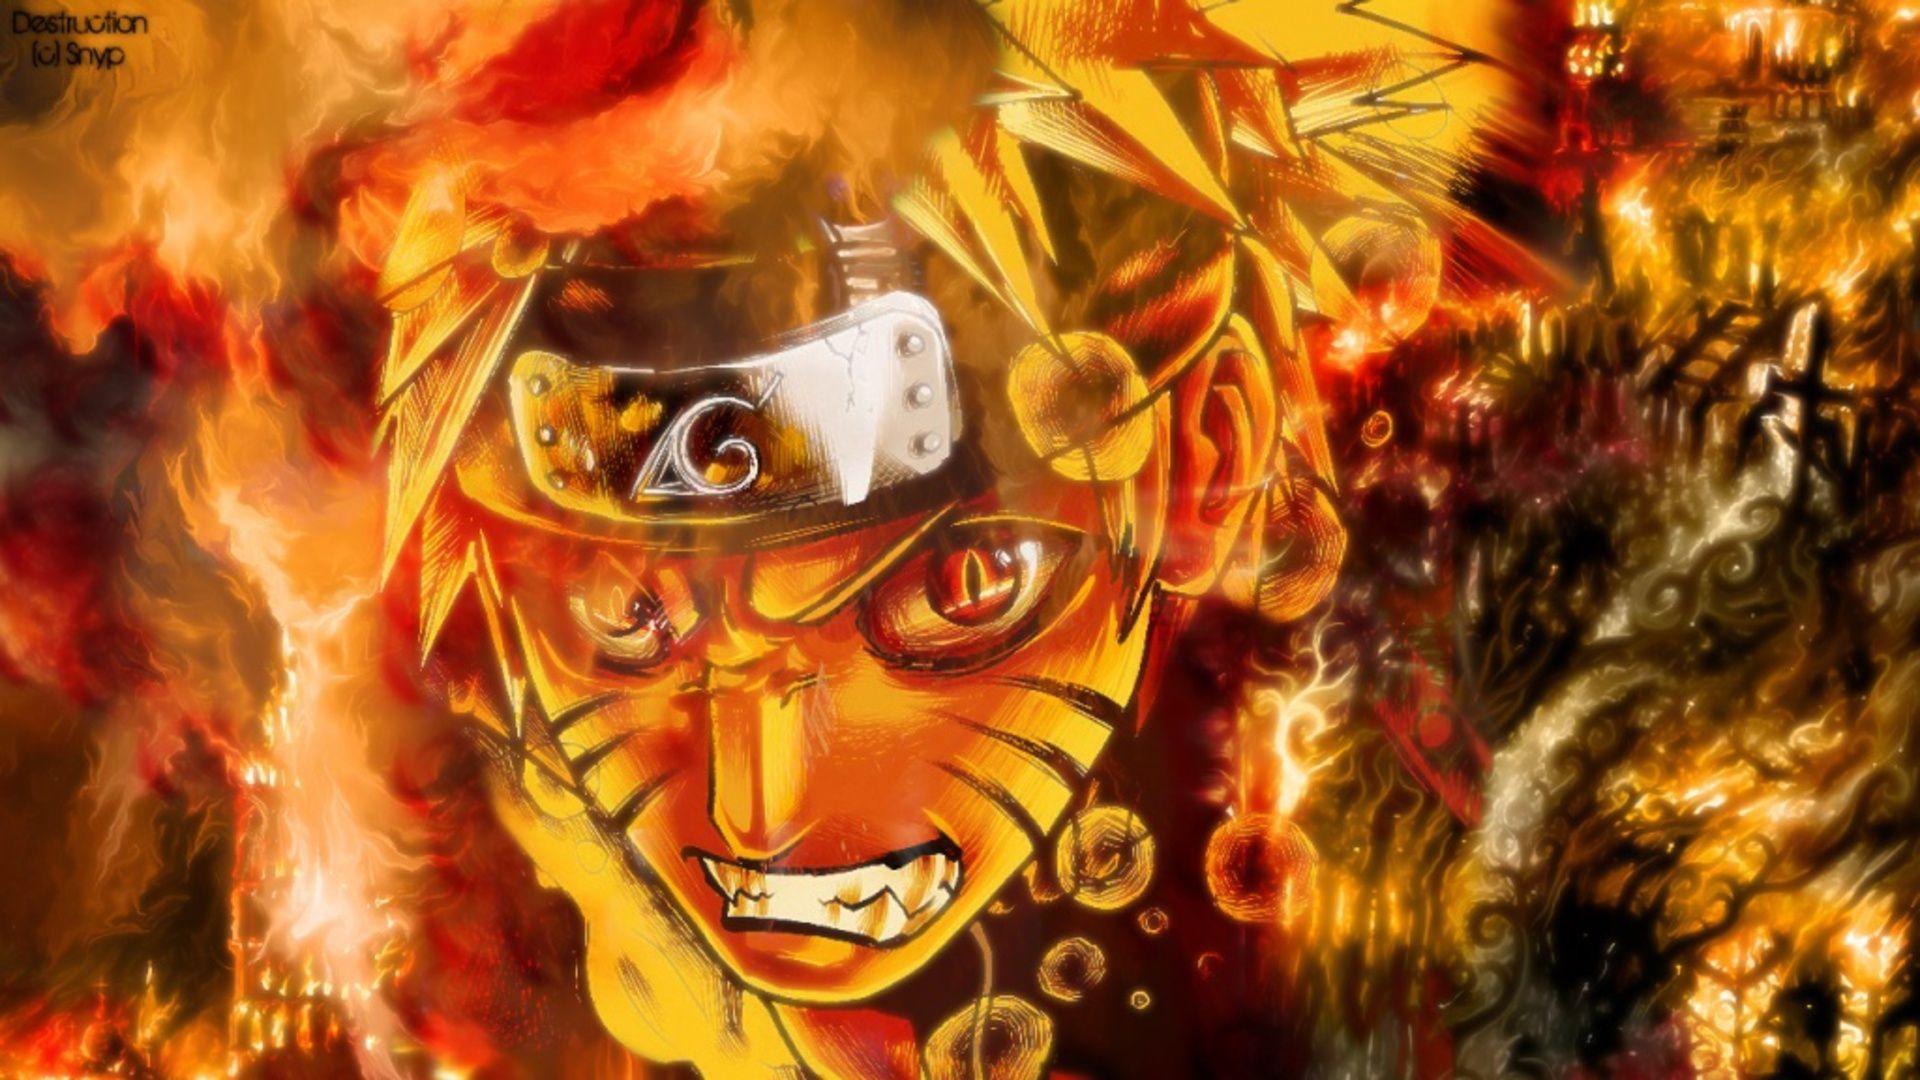 Naruto hd 1080, Cool Wallpaper